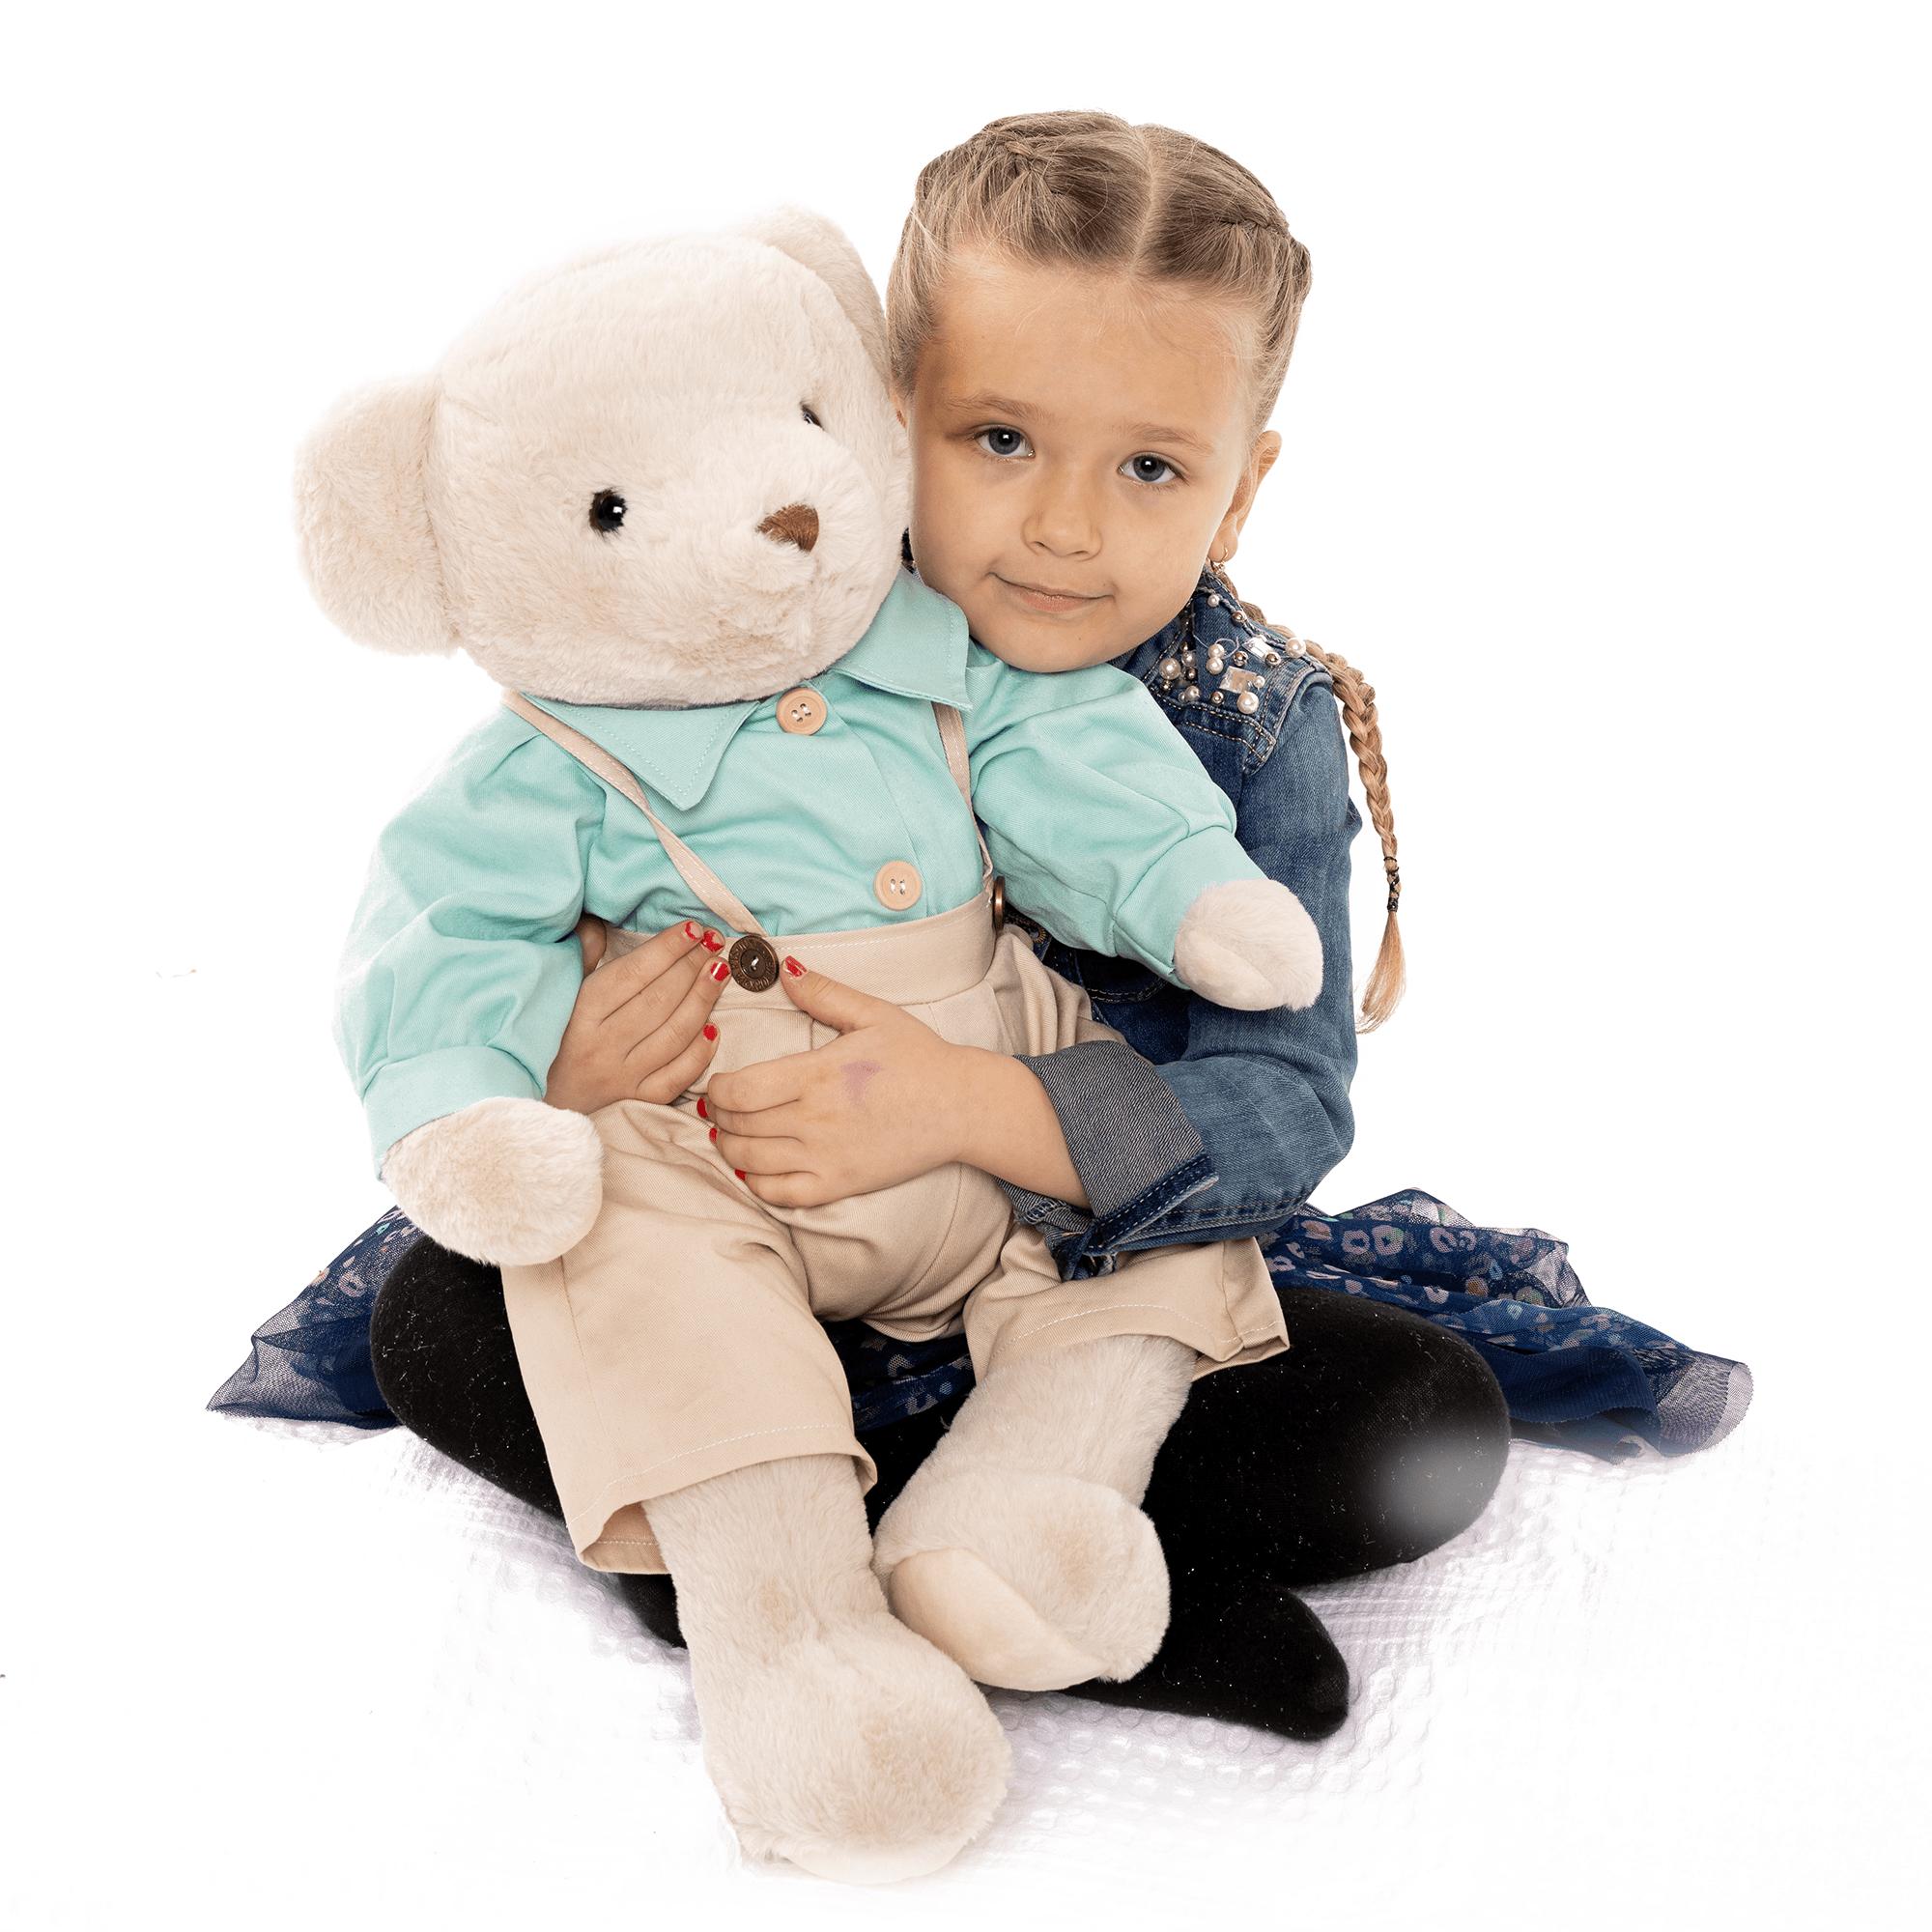 Plyšový medveď, smotanová/modrá, 65cm, MADEN BOY TYP2